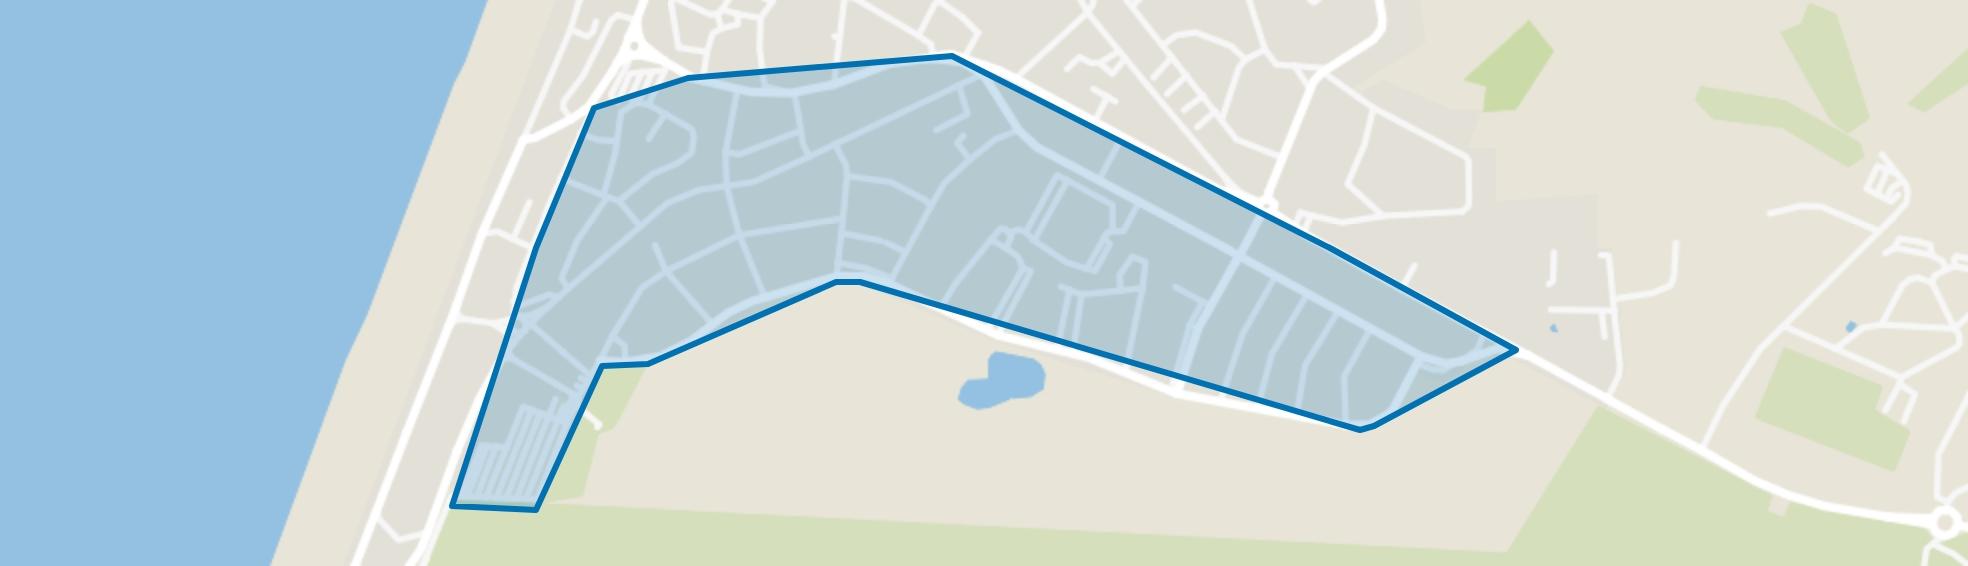 Brederode- Gerkestraat e.o., Zandvoort map